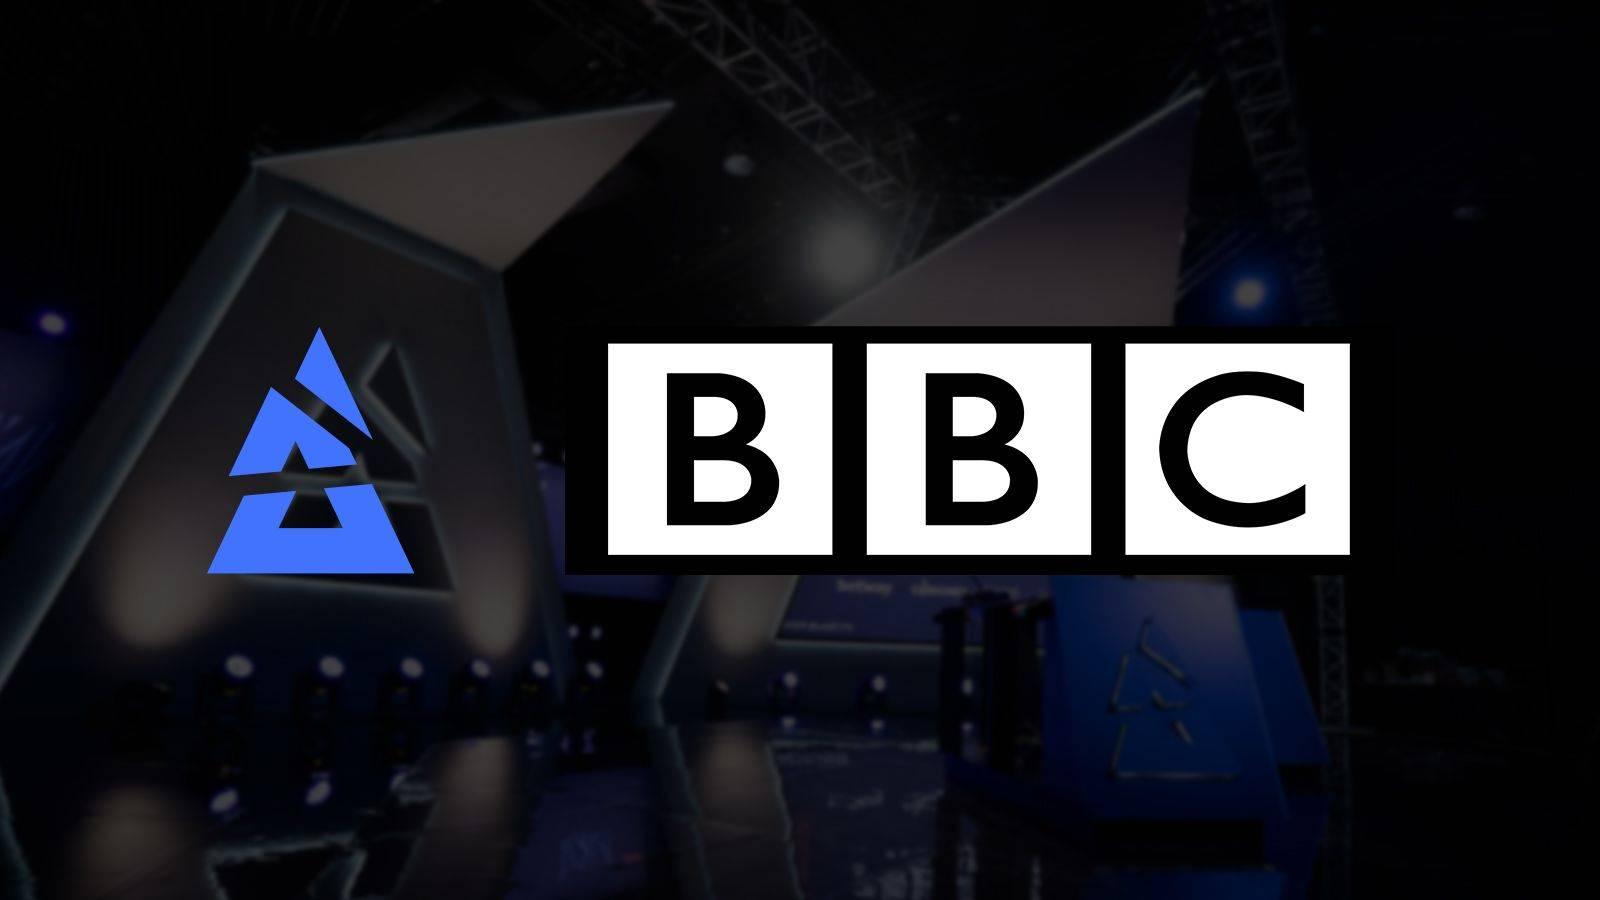 f22ccbf824787f66176b81197e2a32d3.BLAST Premier BBC iPlayer